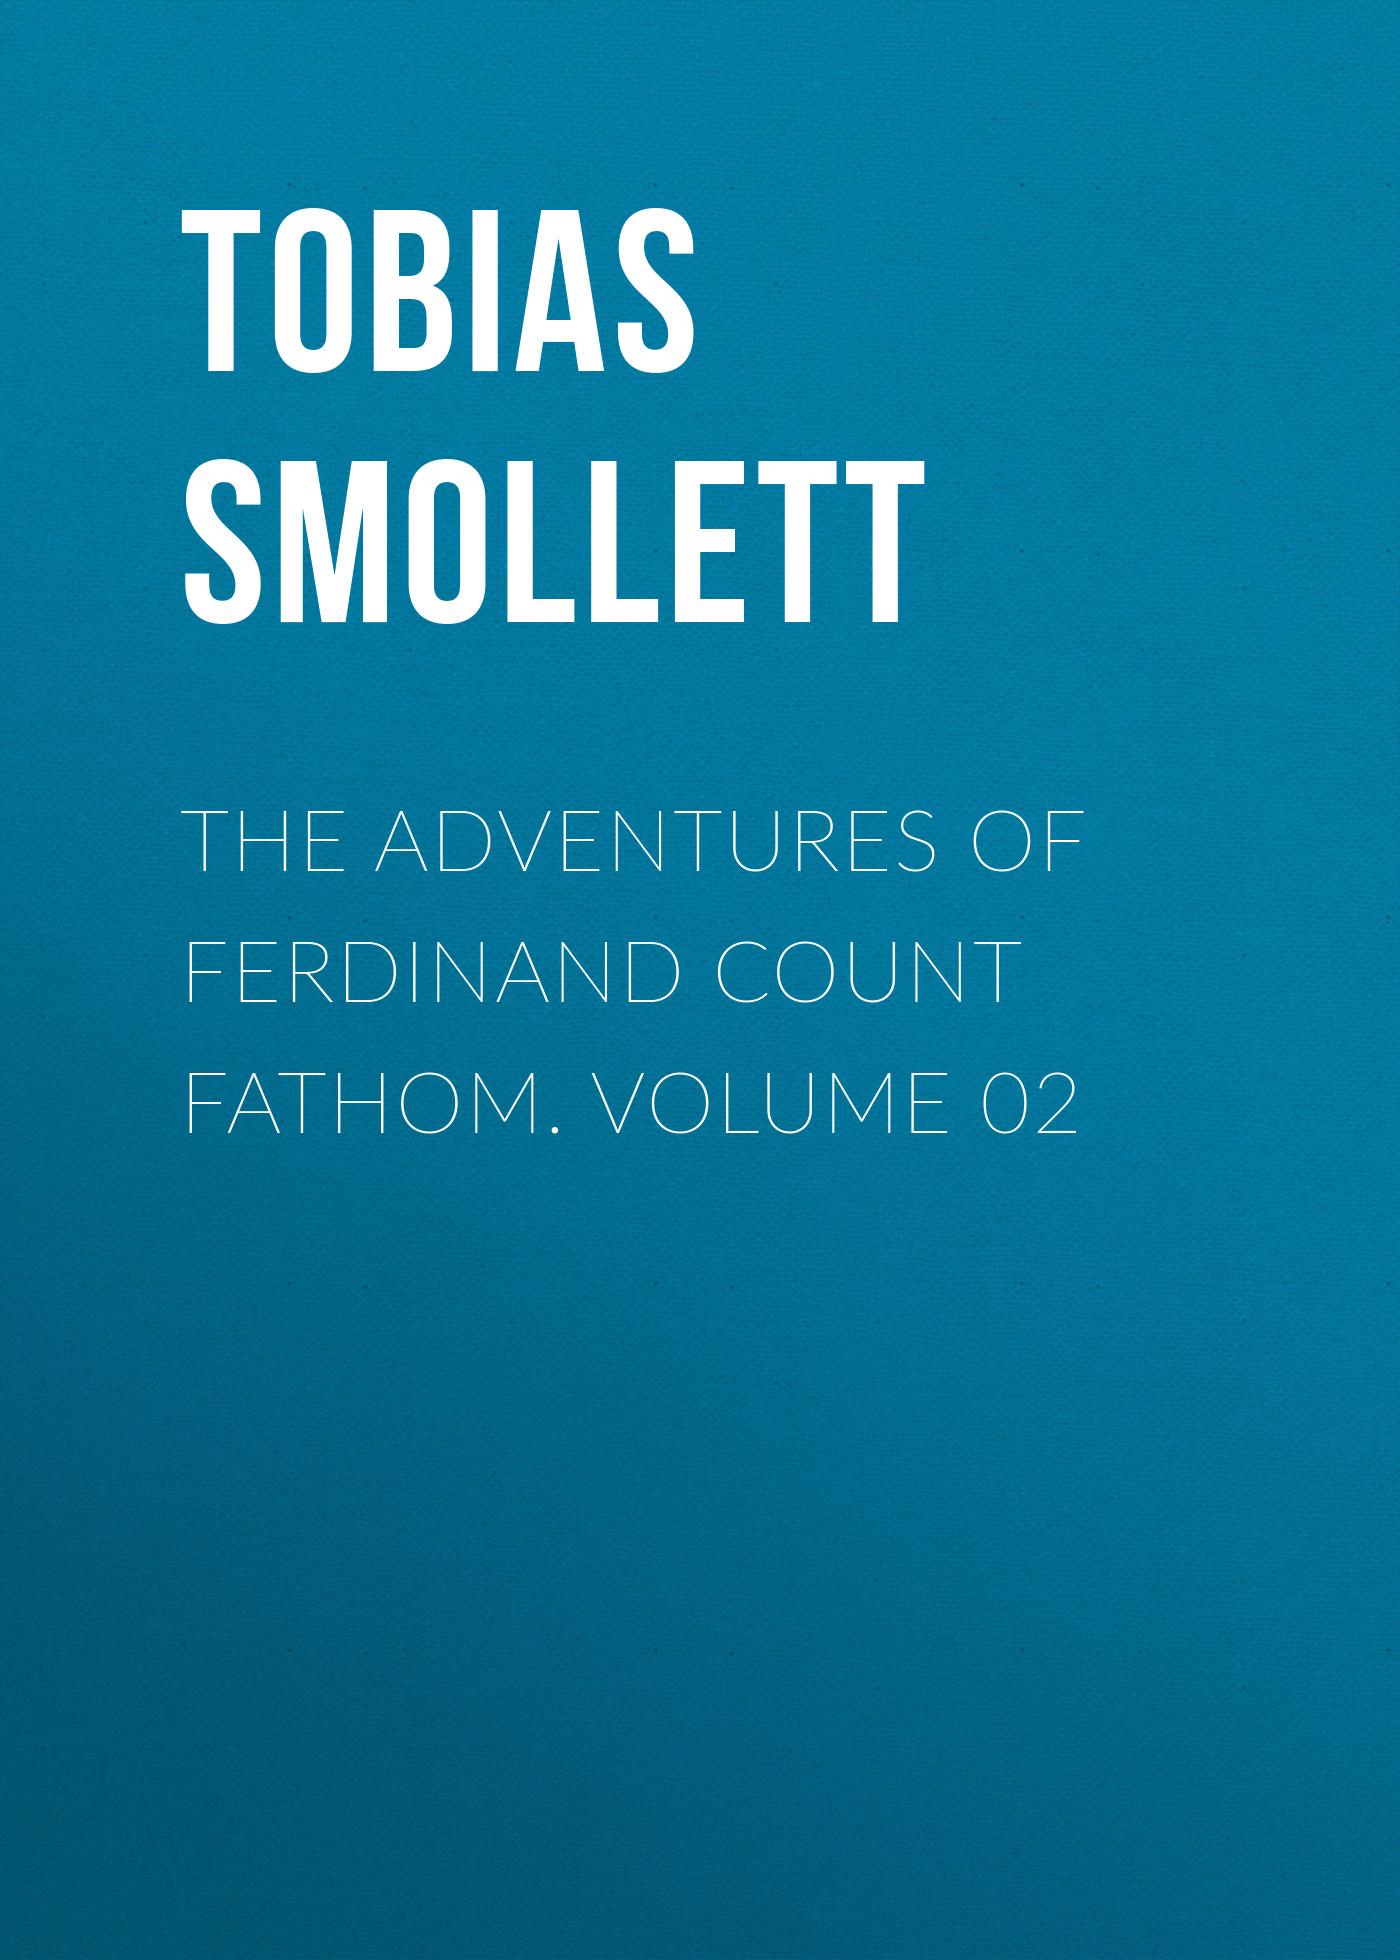 Tobias Smollett The Adventures of Ferdinand Count Fathom. Volume 02 tobias smollett travels through france and italy